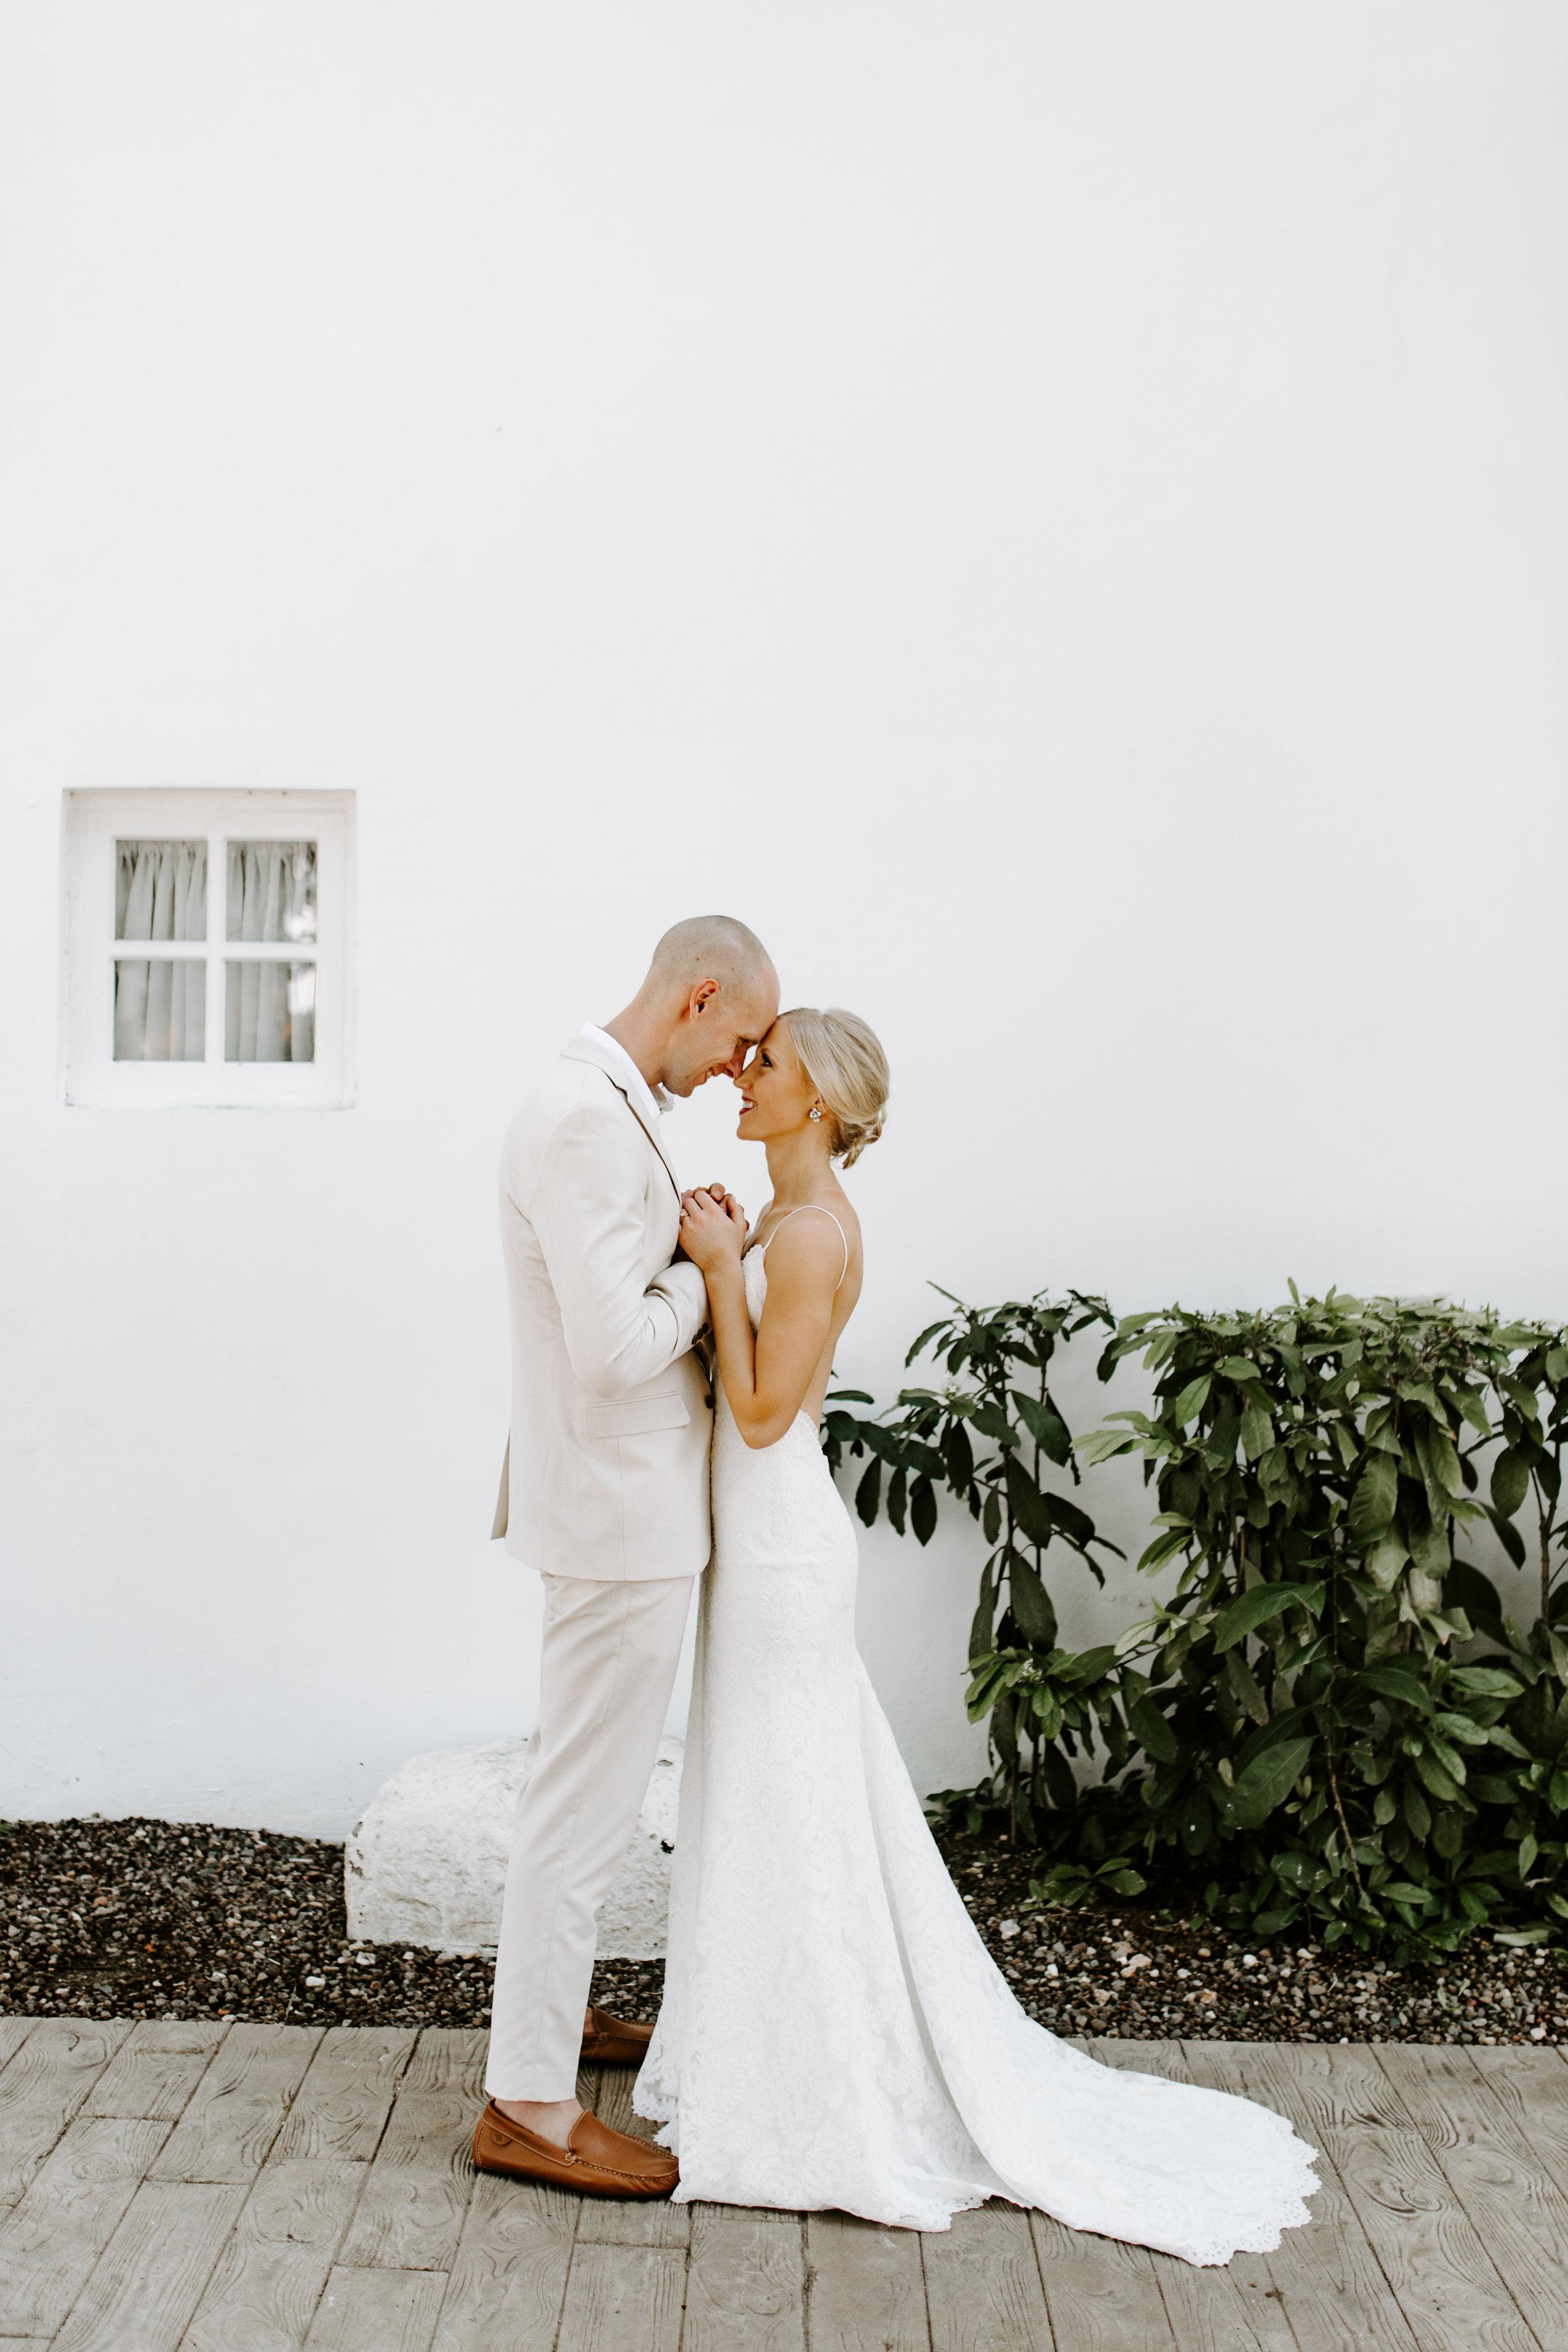 beach wedding, destination wedding, beach bride, katie may, katie may bridal, backless dress, backless wedding dress, backless wedding gown, define fettle